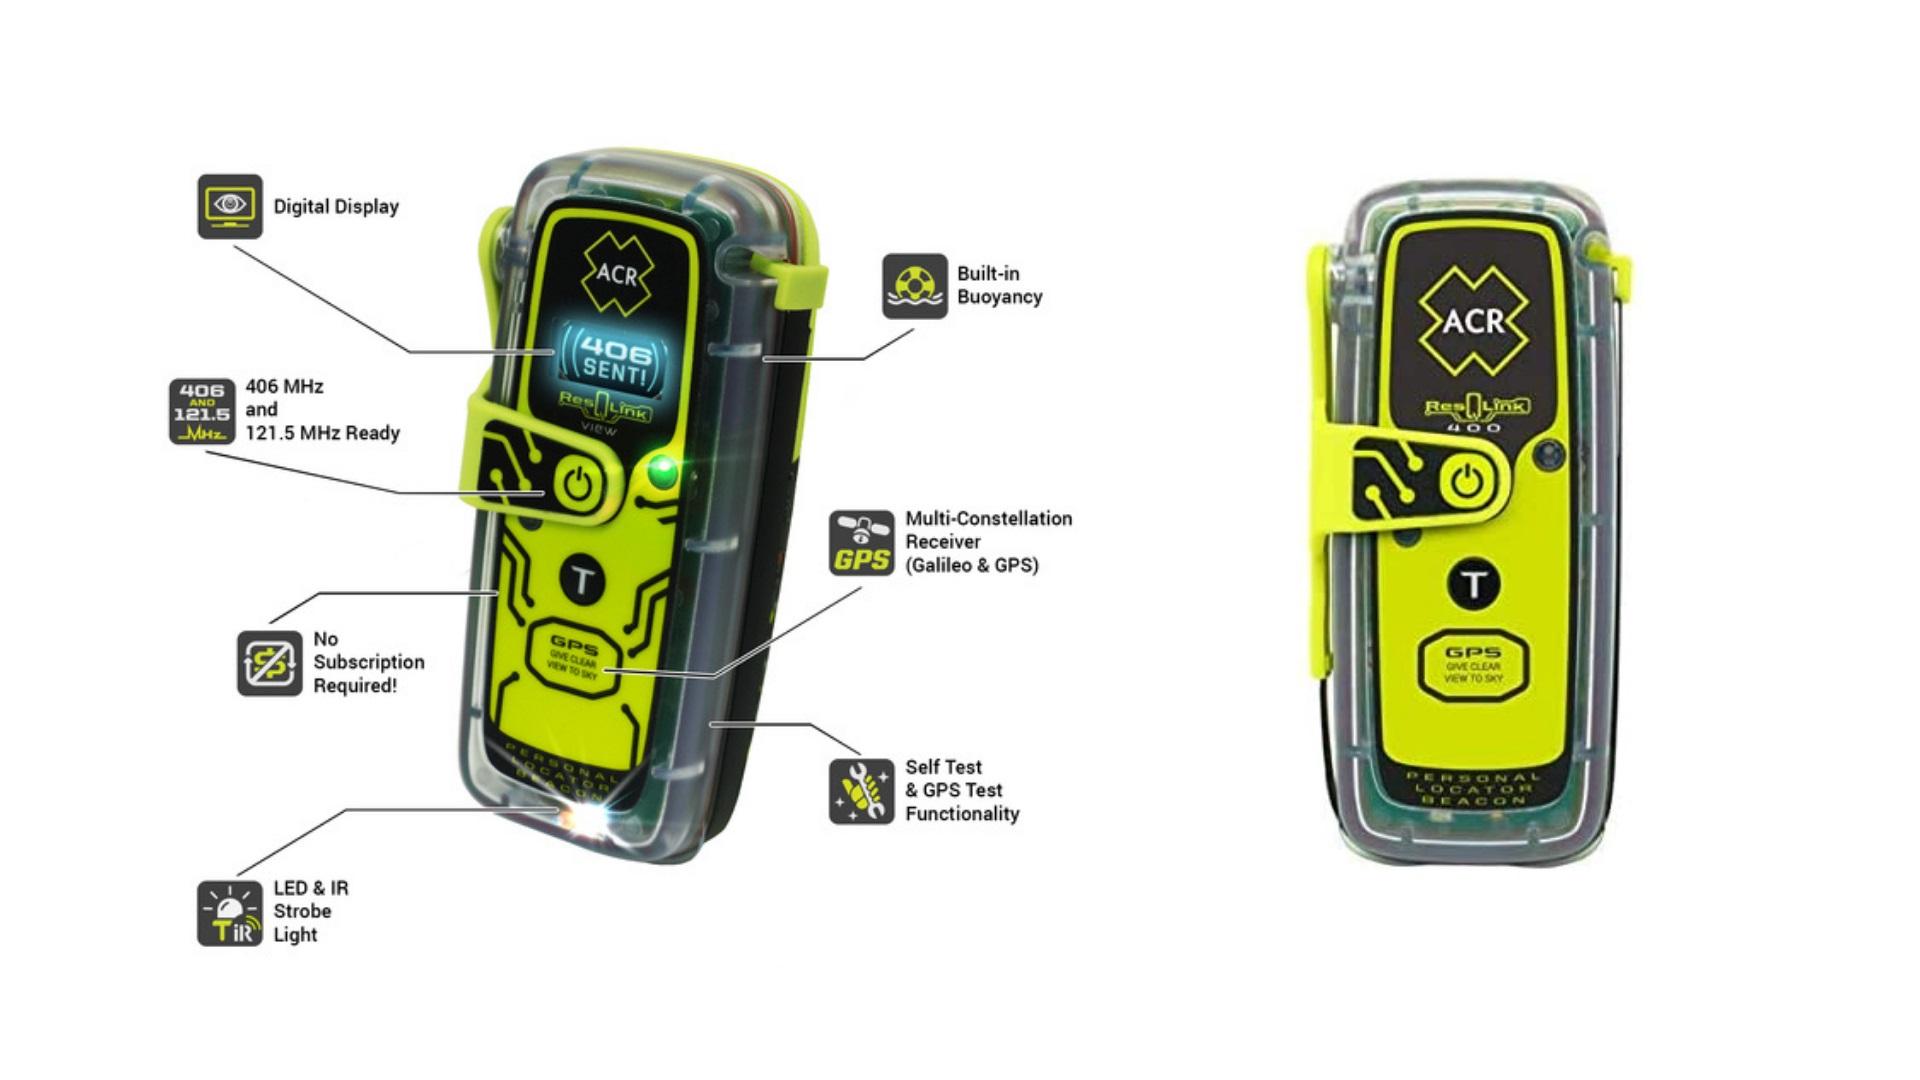 ACR ResQLink 400 - Buoyant GPS Personal Locator